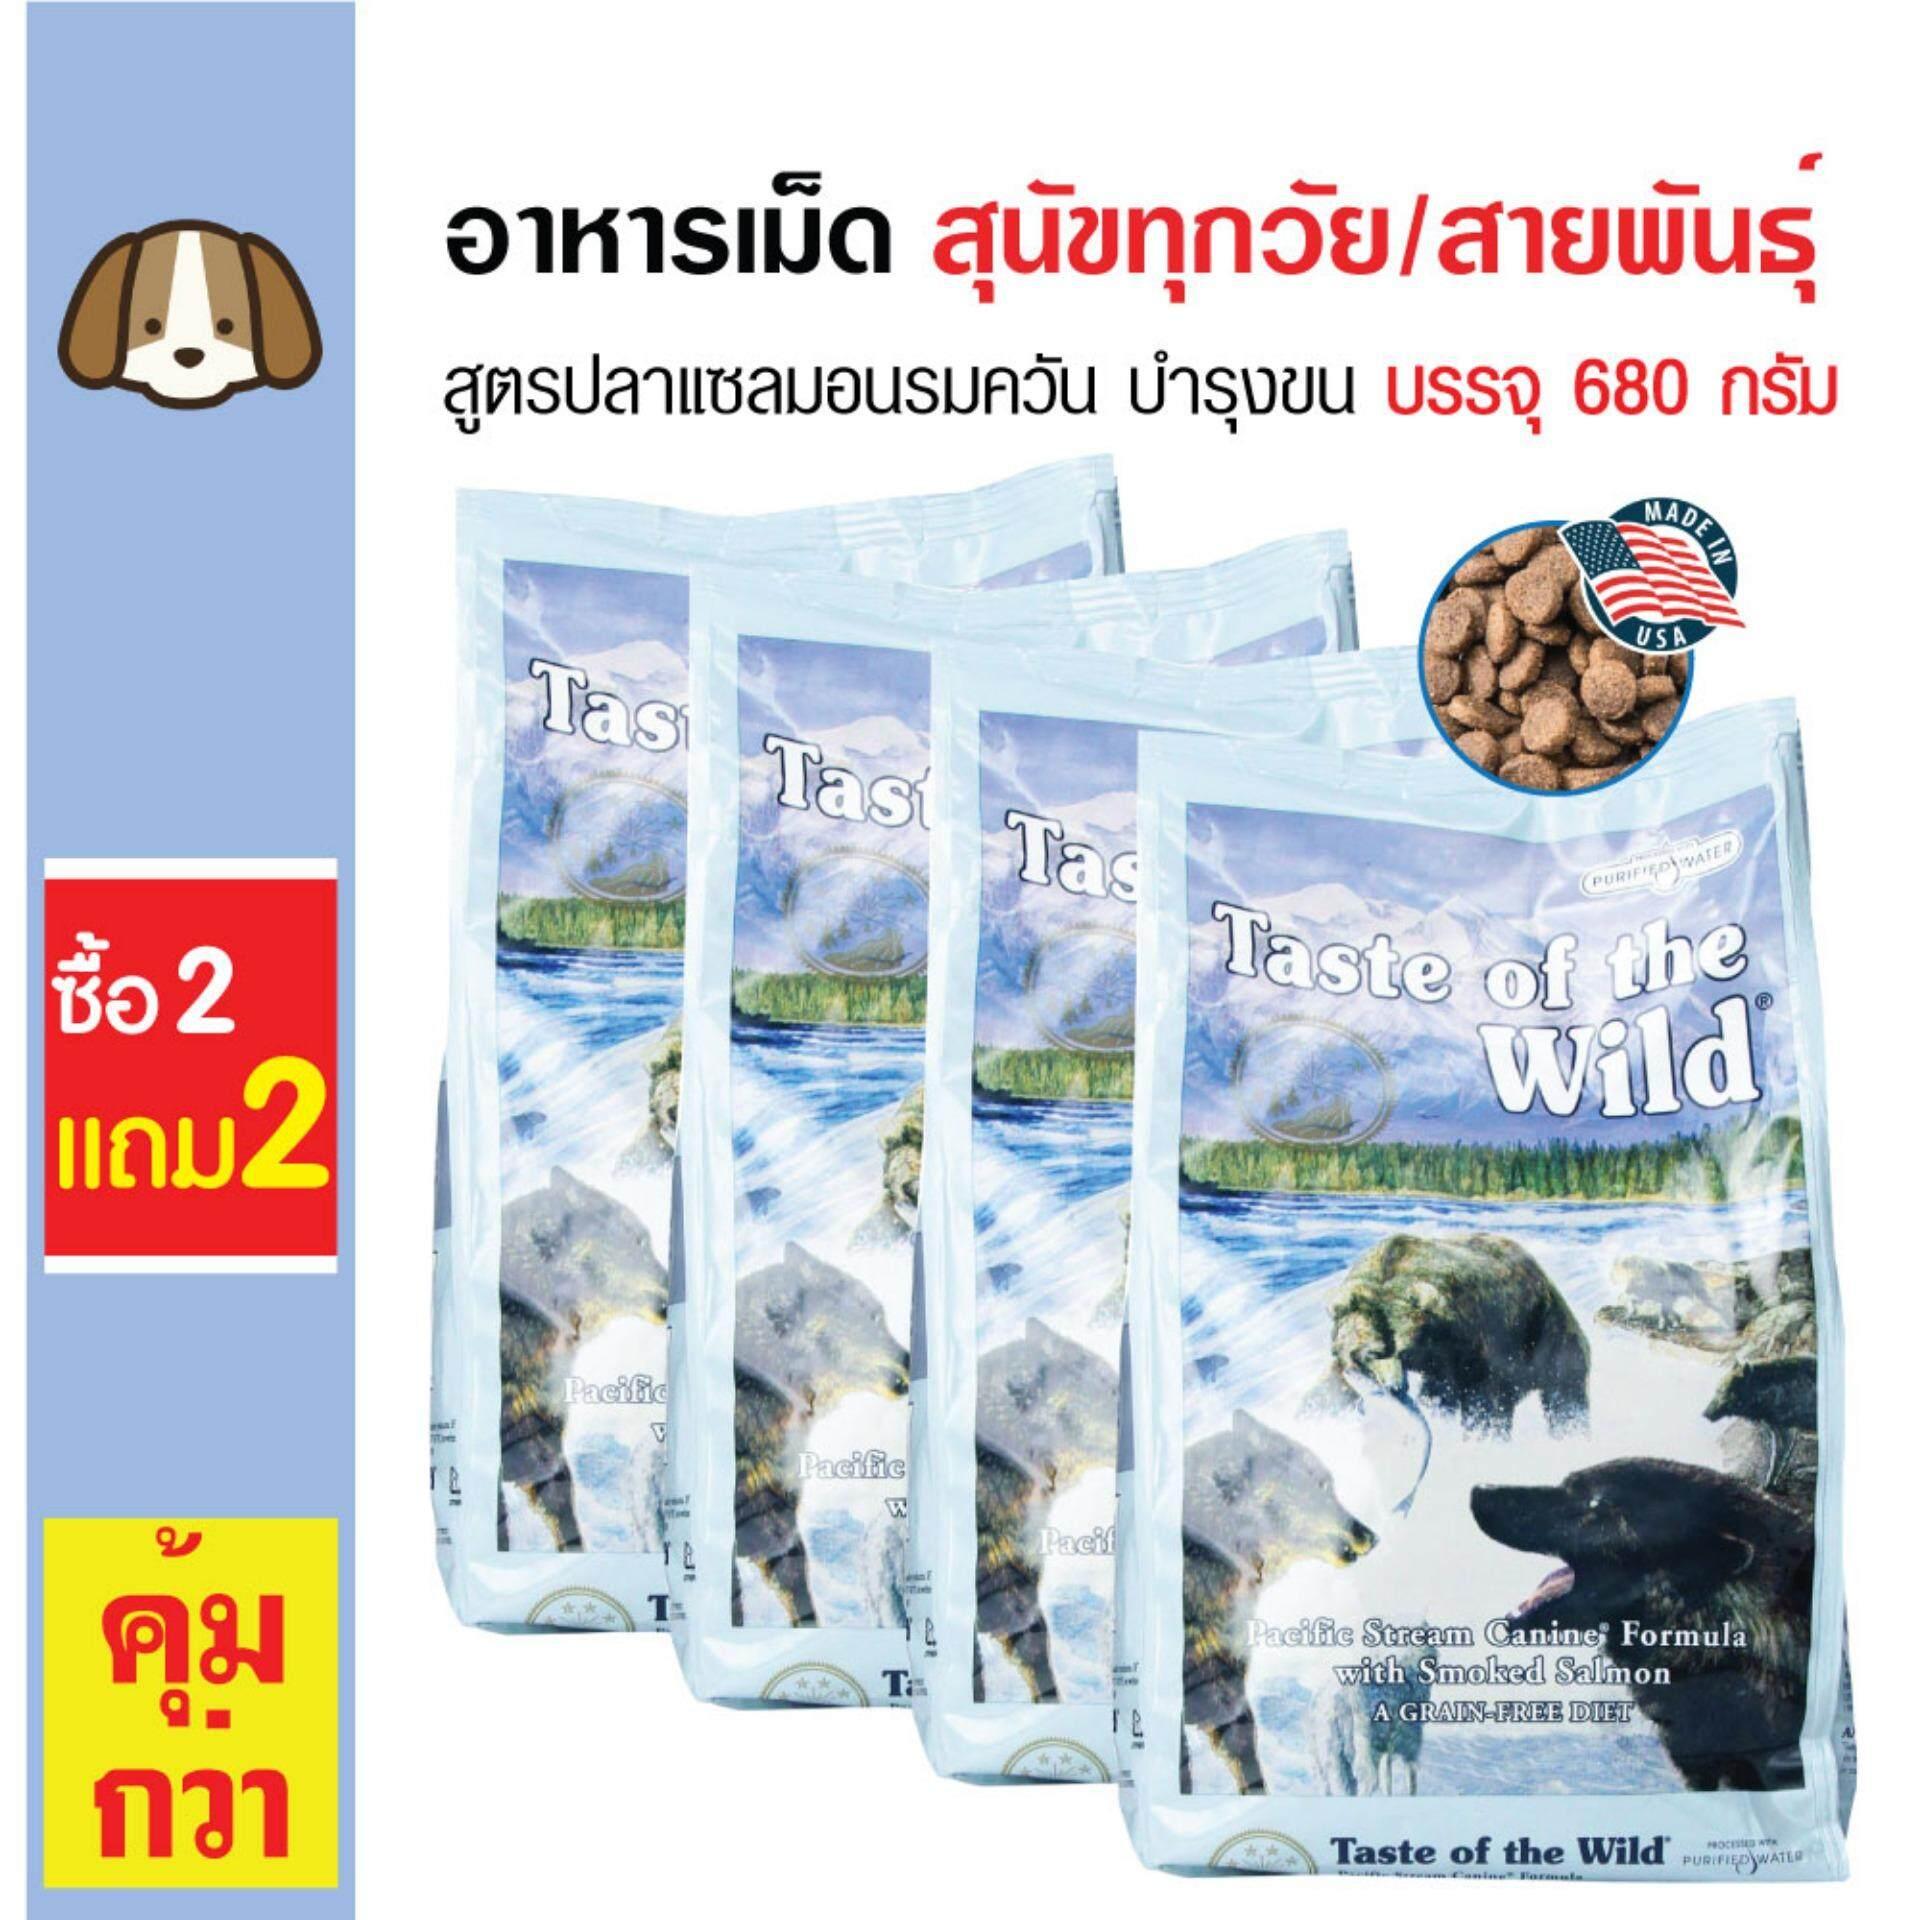 Taste Of The Wild อาหารเม็ดสุนัข สูตรปลาแซลมอนรมควัน บำรุงขนและผิวหนัง สำหรับสุนัขทุกวัย ทุกสายพันธุ์ ขนาด 680 กรัม (ซื้อ 2 แถม 2).